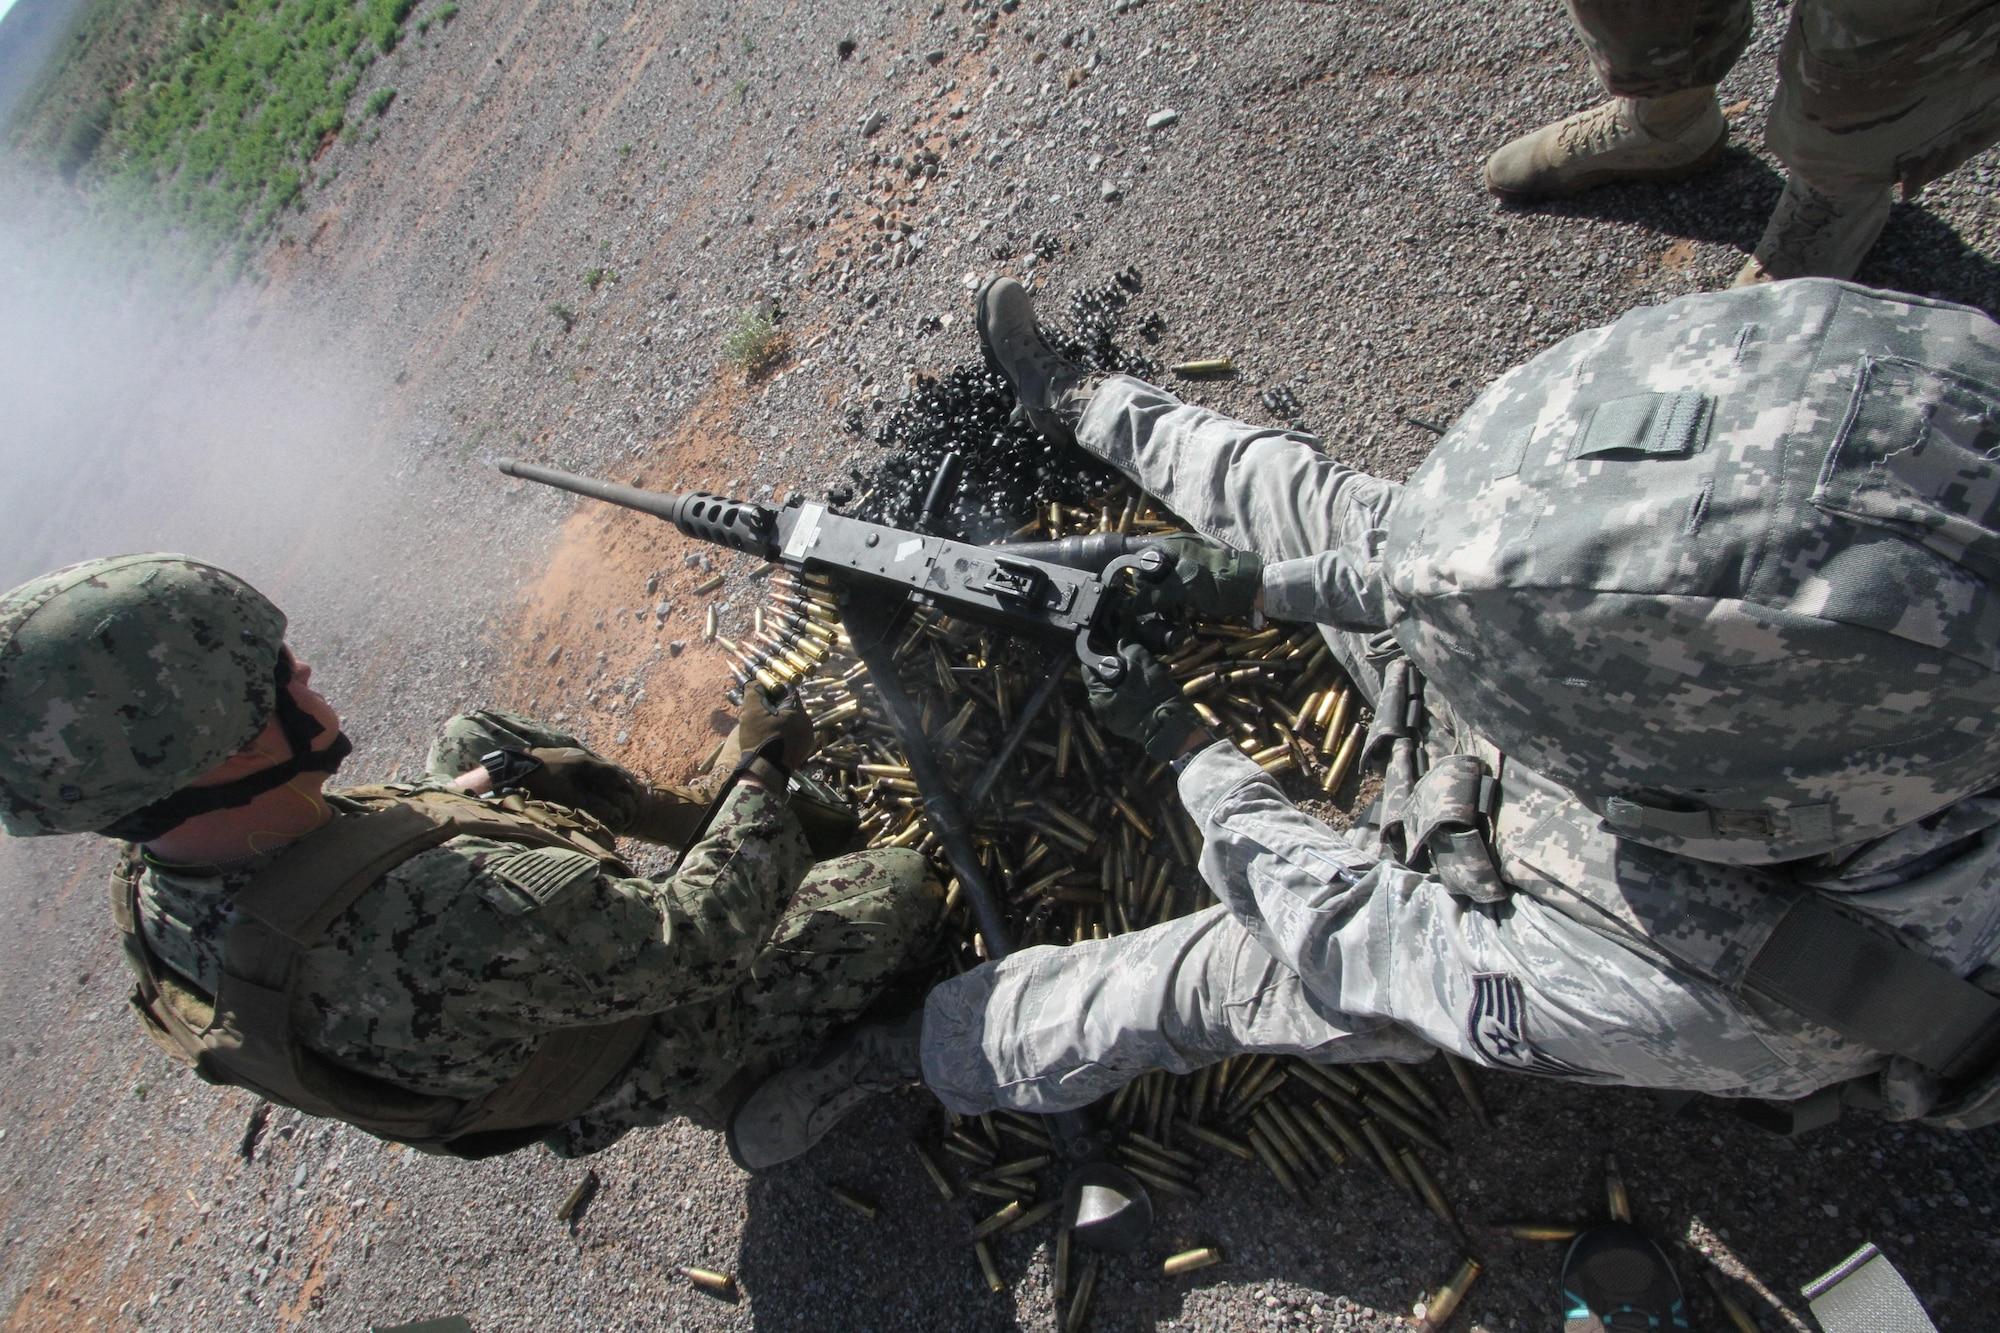 Gunner Staff Sgt. Joshua Hopkins fires the M2 .50 caliber machine gun while assistant gunner U.S. Petty Officer 3rd Class Derek Dick monitors ammunition during heavy weapons firing on Fort Bliss' Range 39.